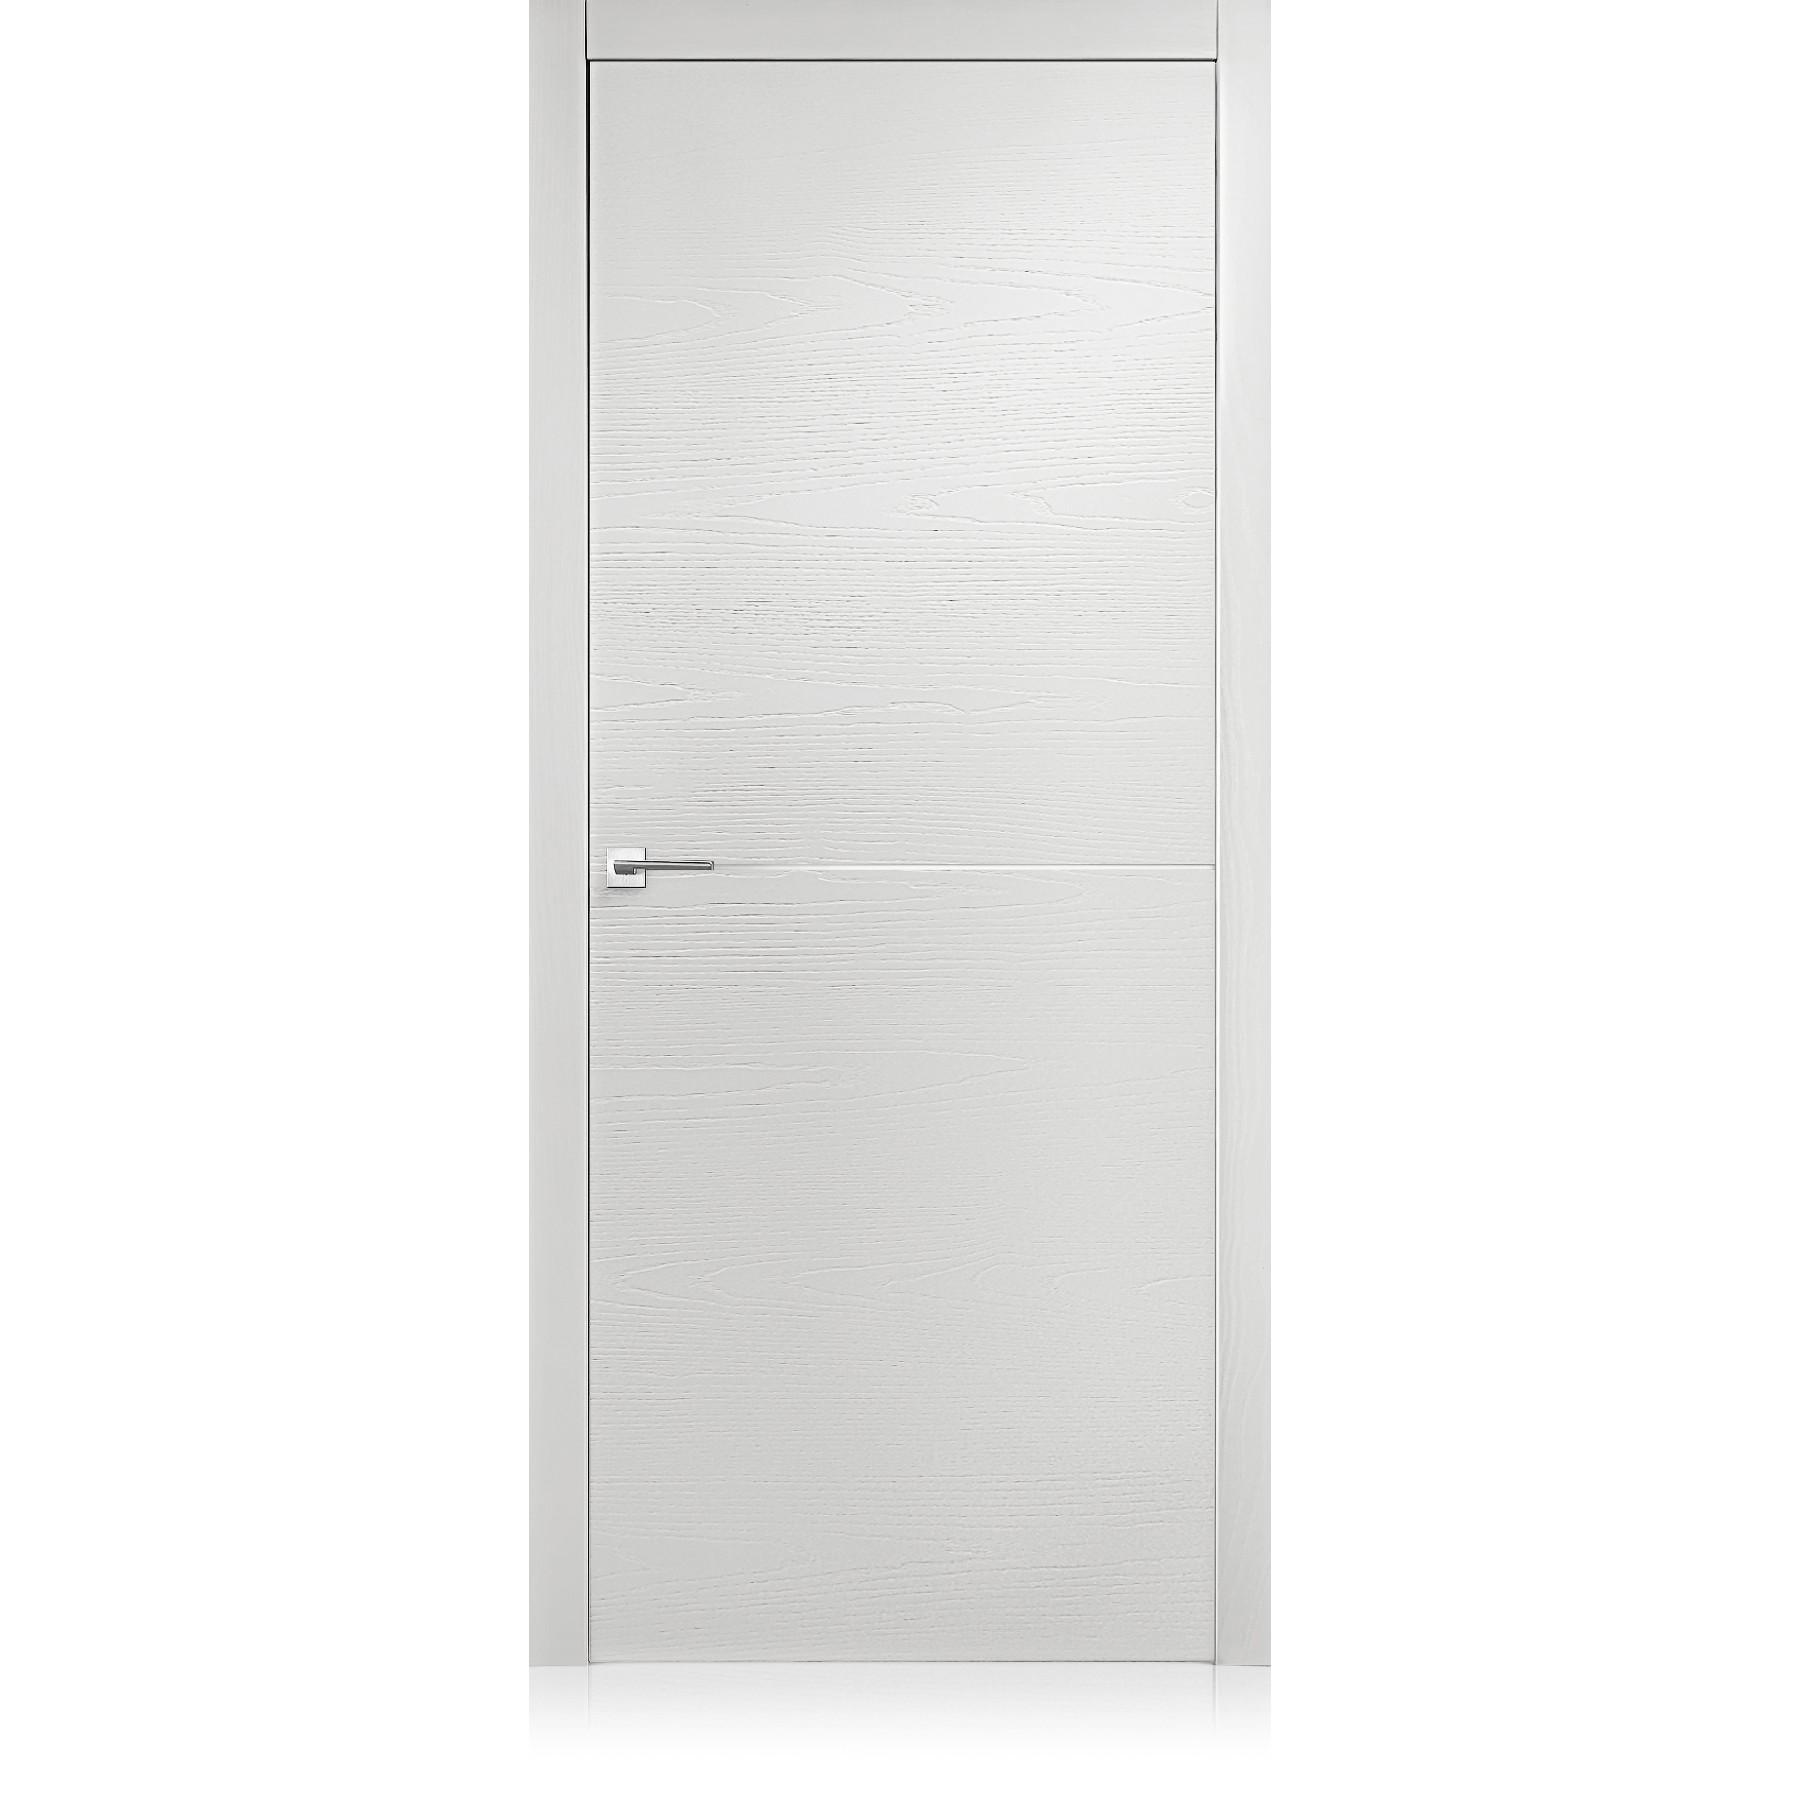 Equa / 1 trame bianco optical door